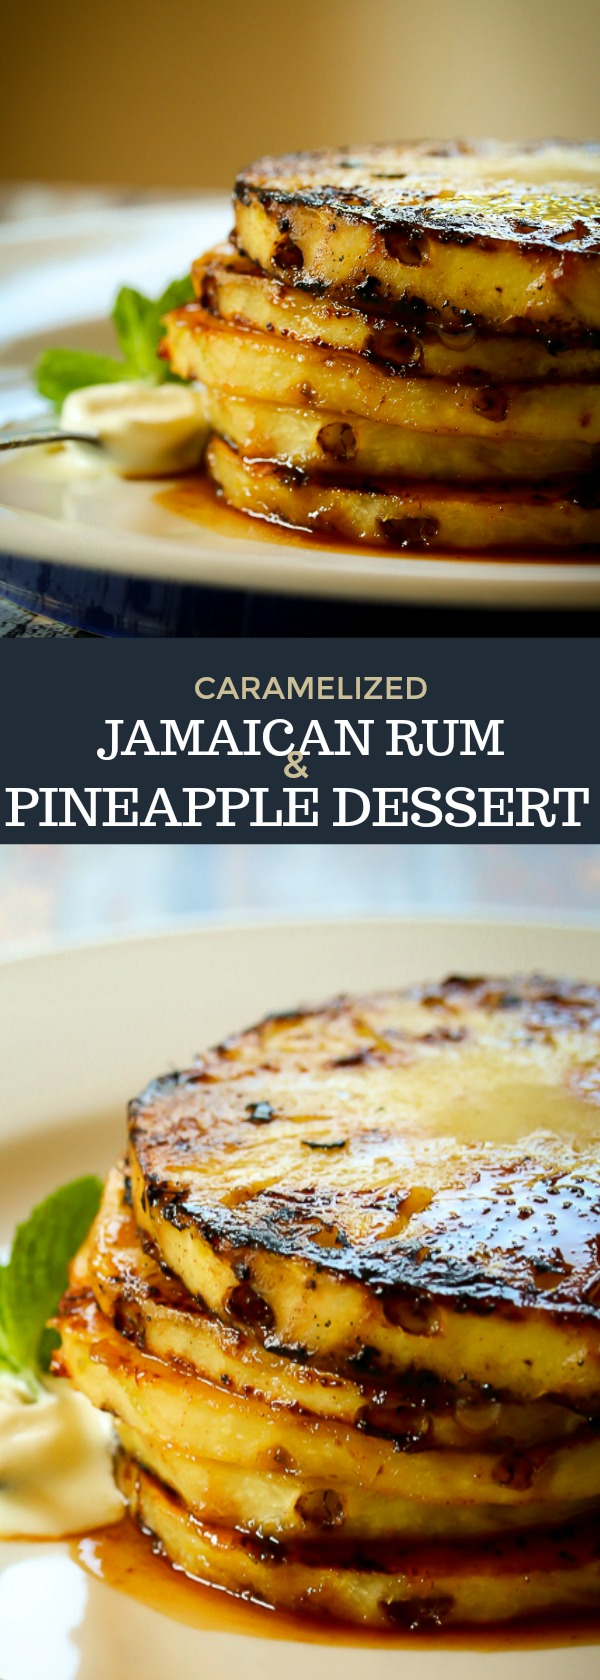 Caramelized Jamaican Rum & Pineapple Dessert